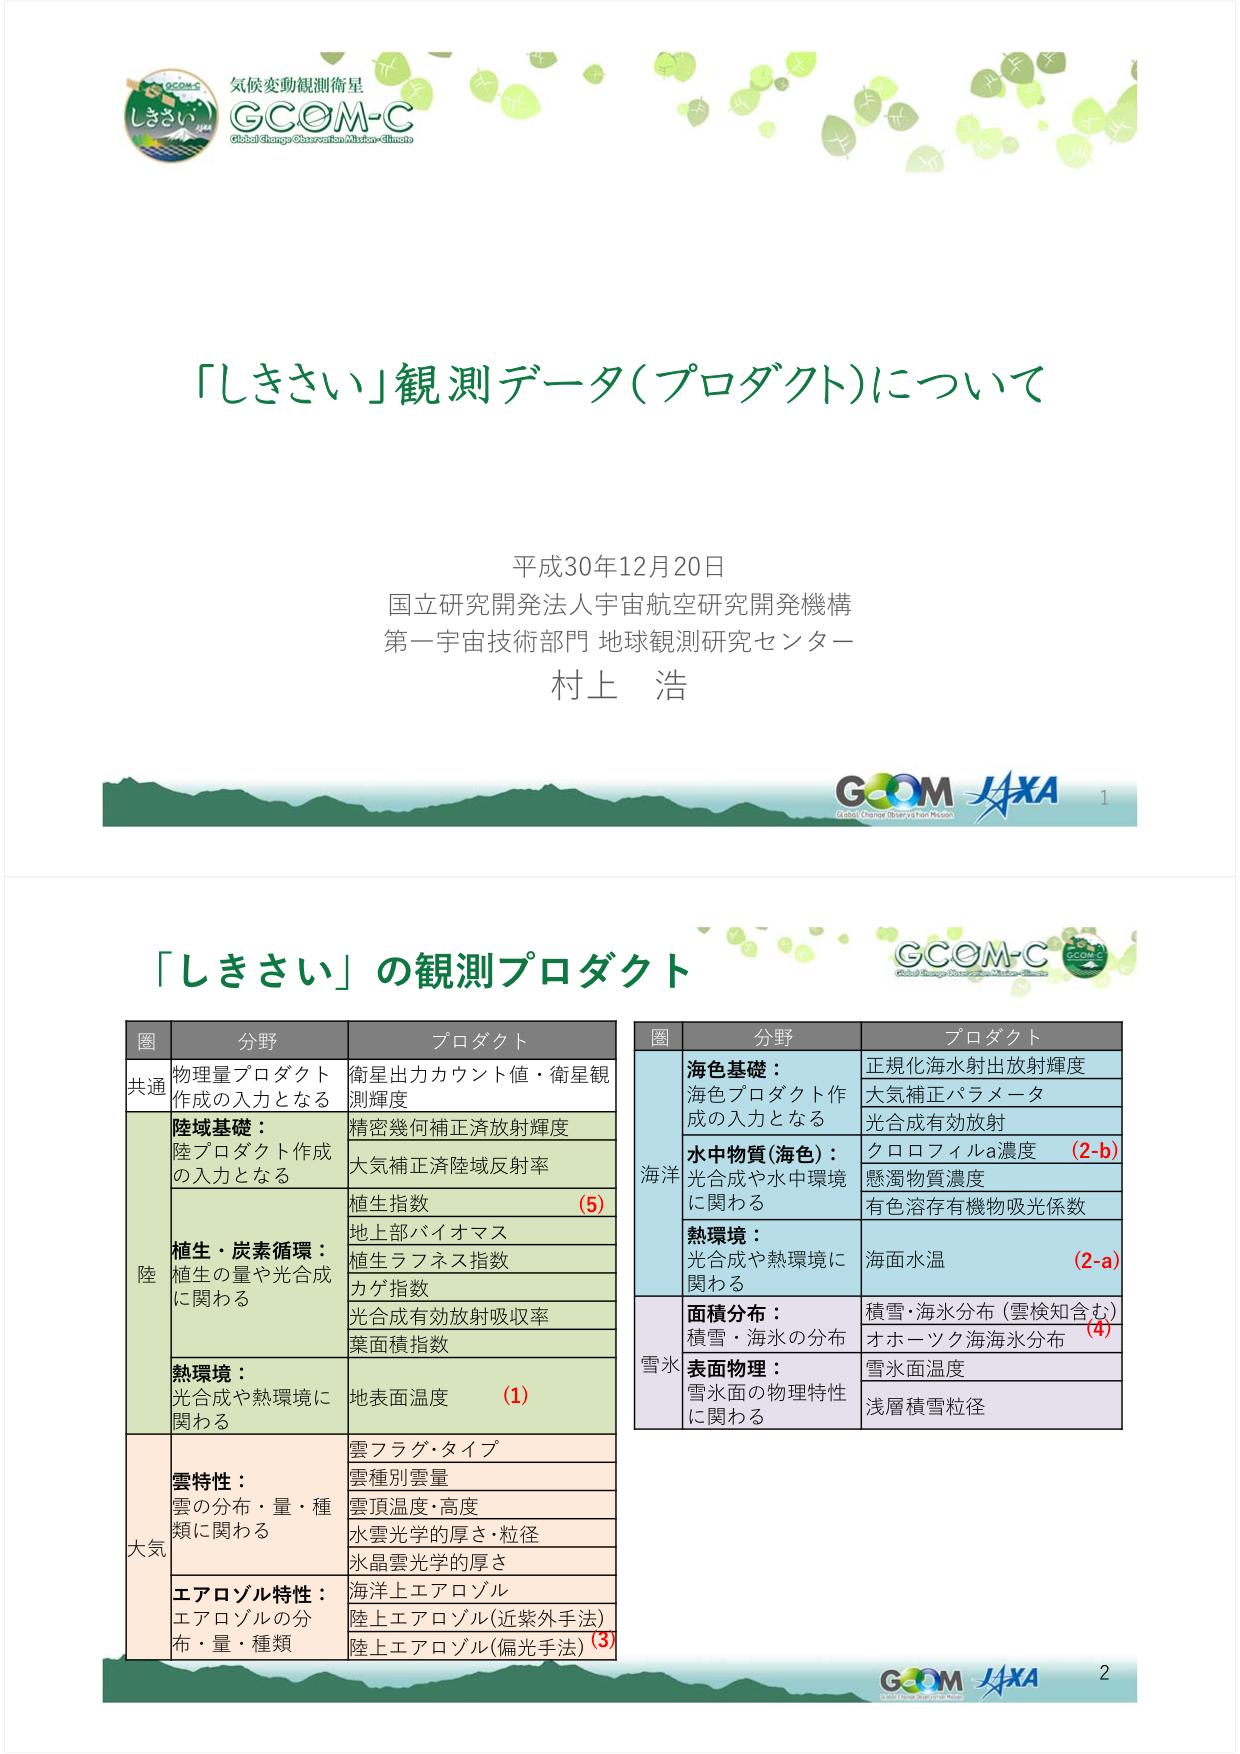 f:id:Imamura:20181220152510p:plain